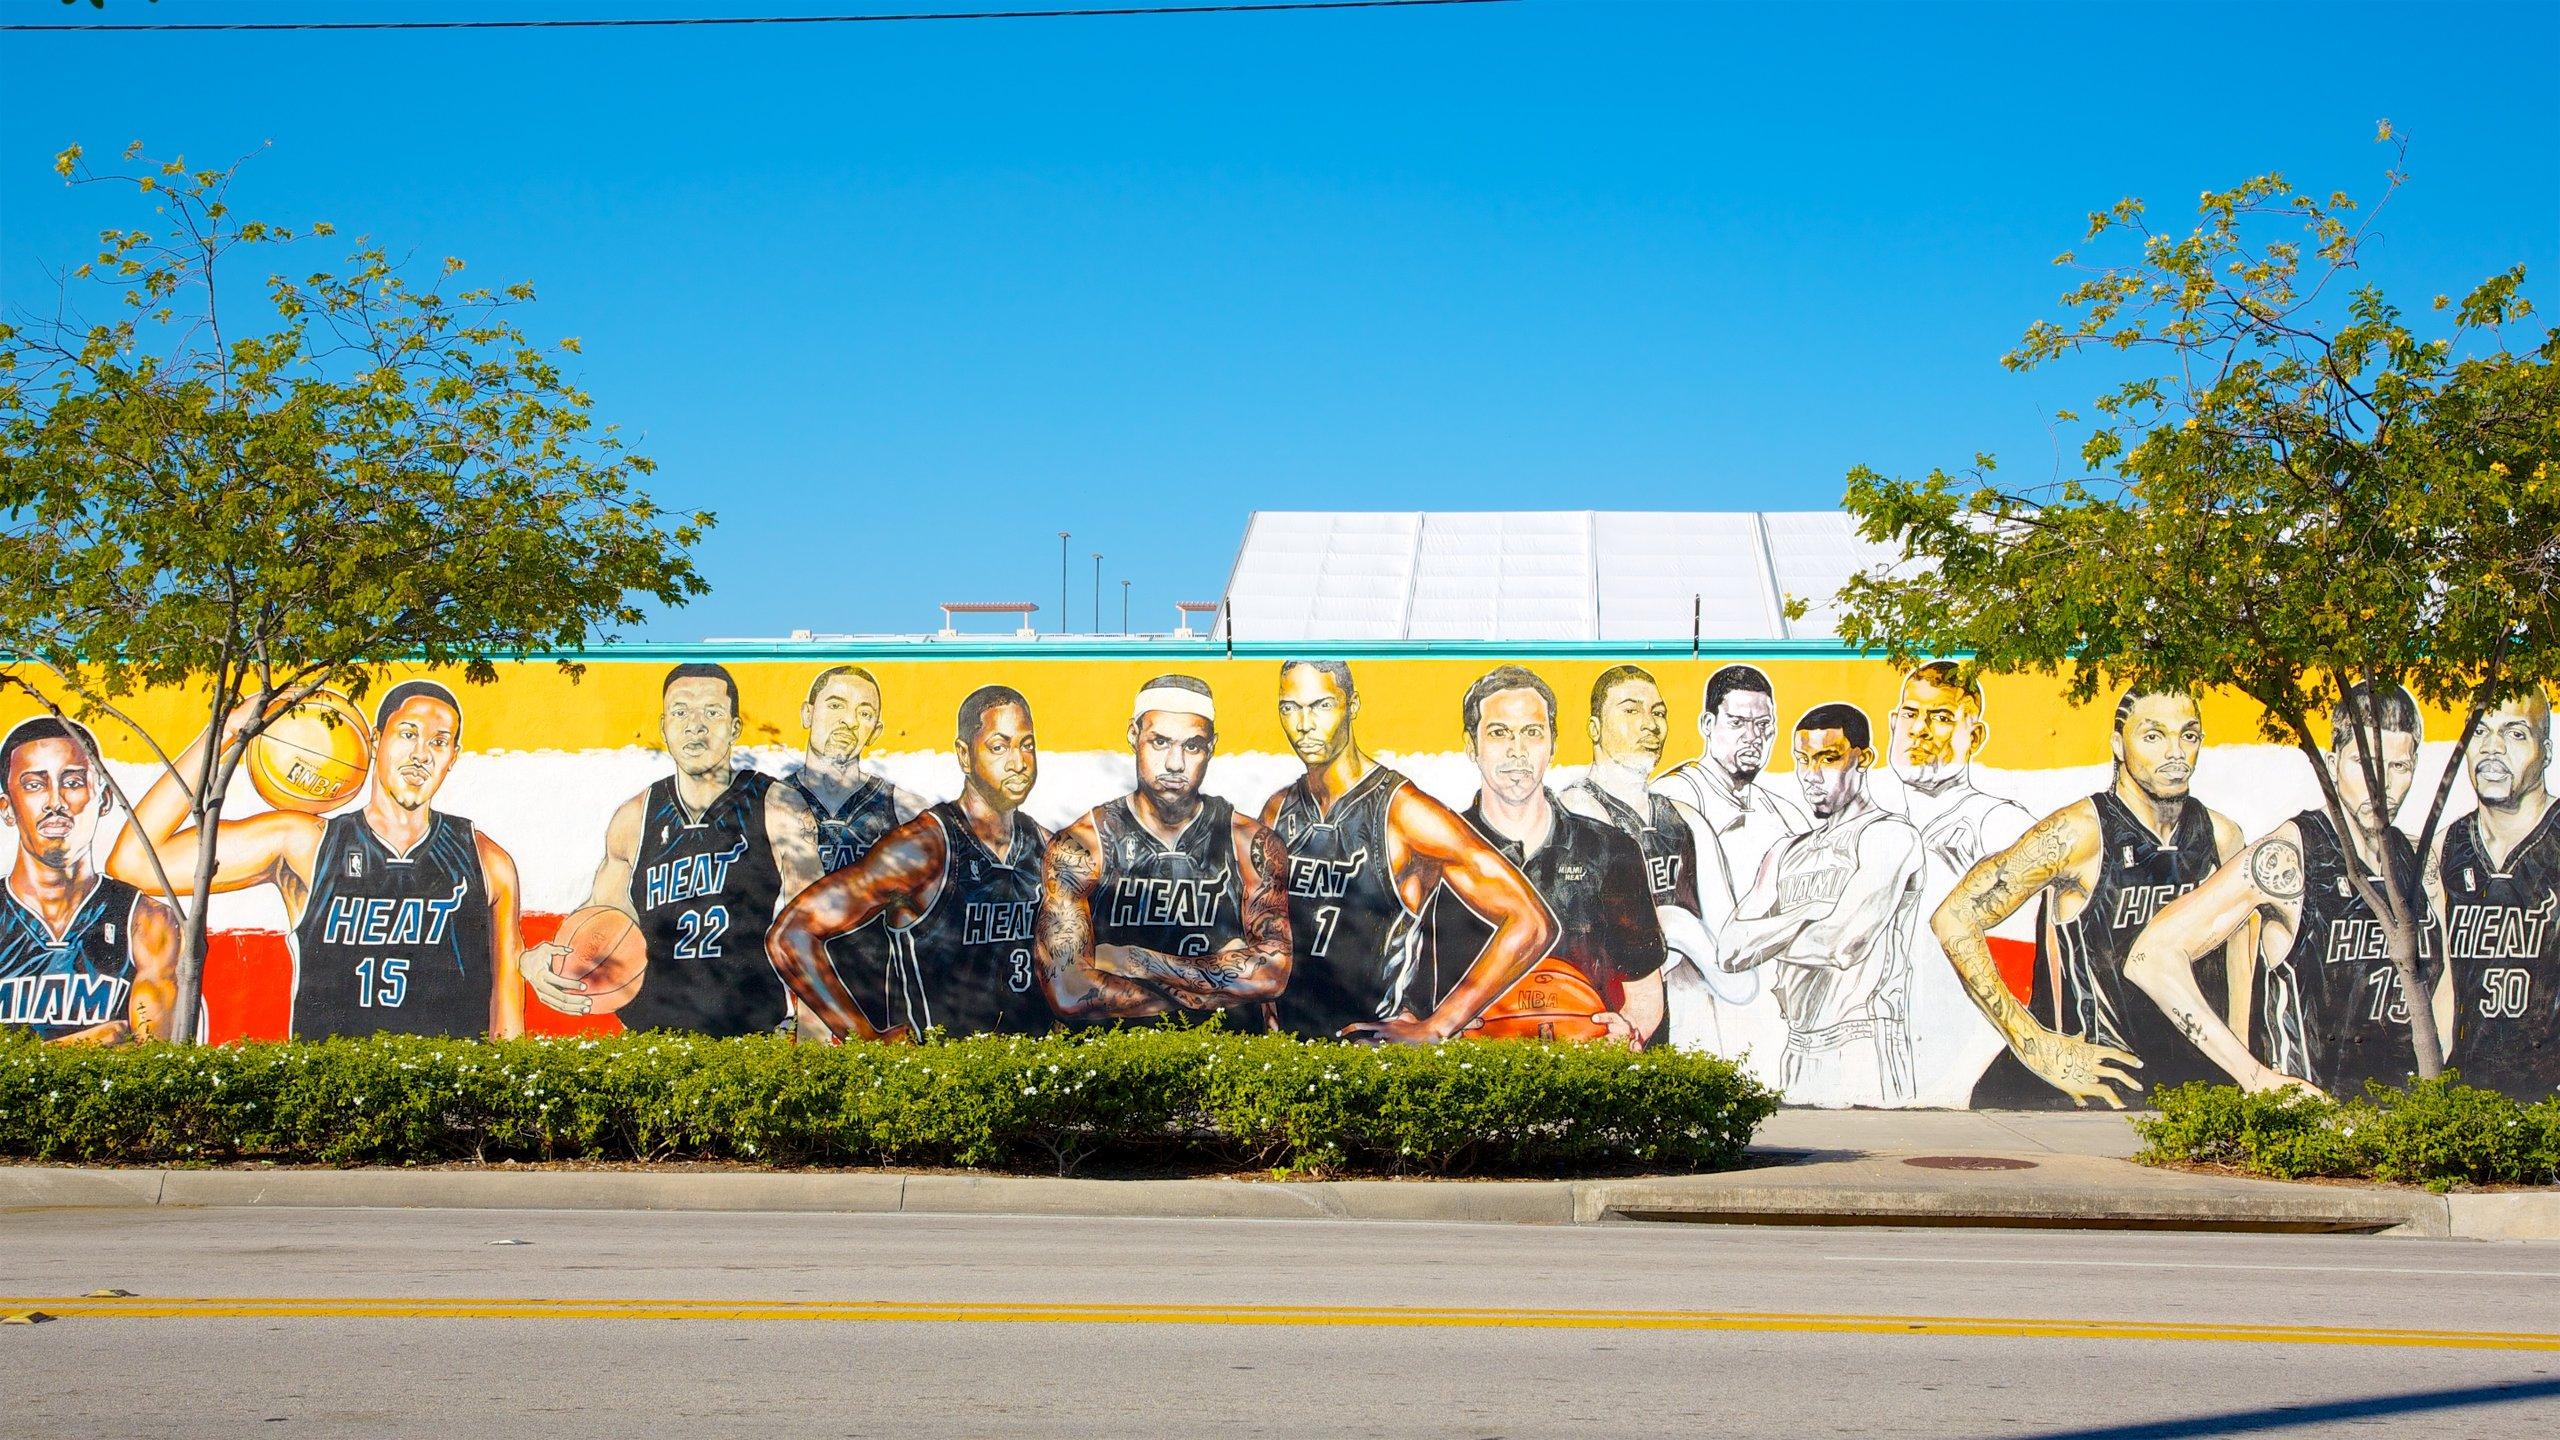 Midtown, Miami, Florida, United States of America